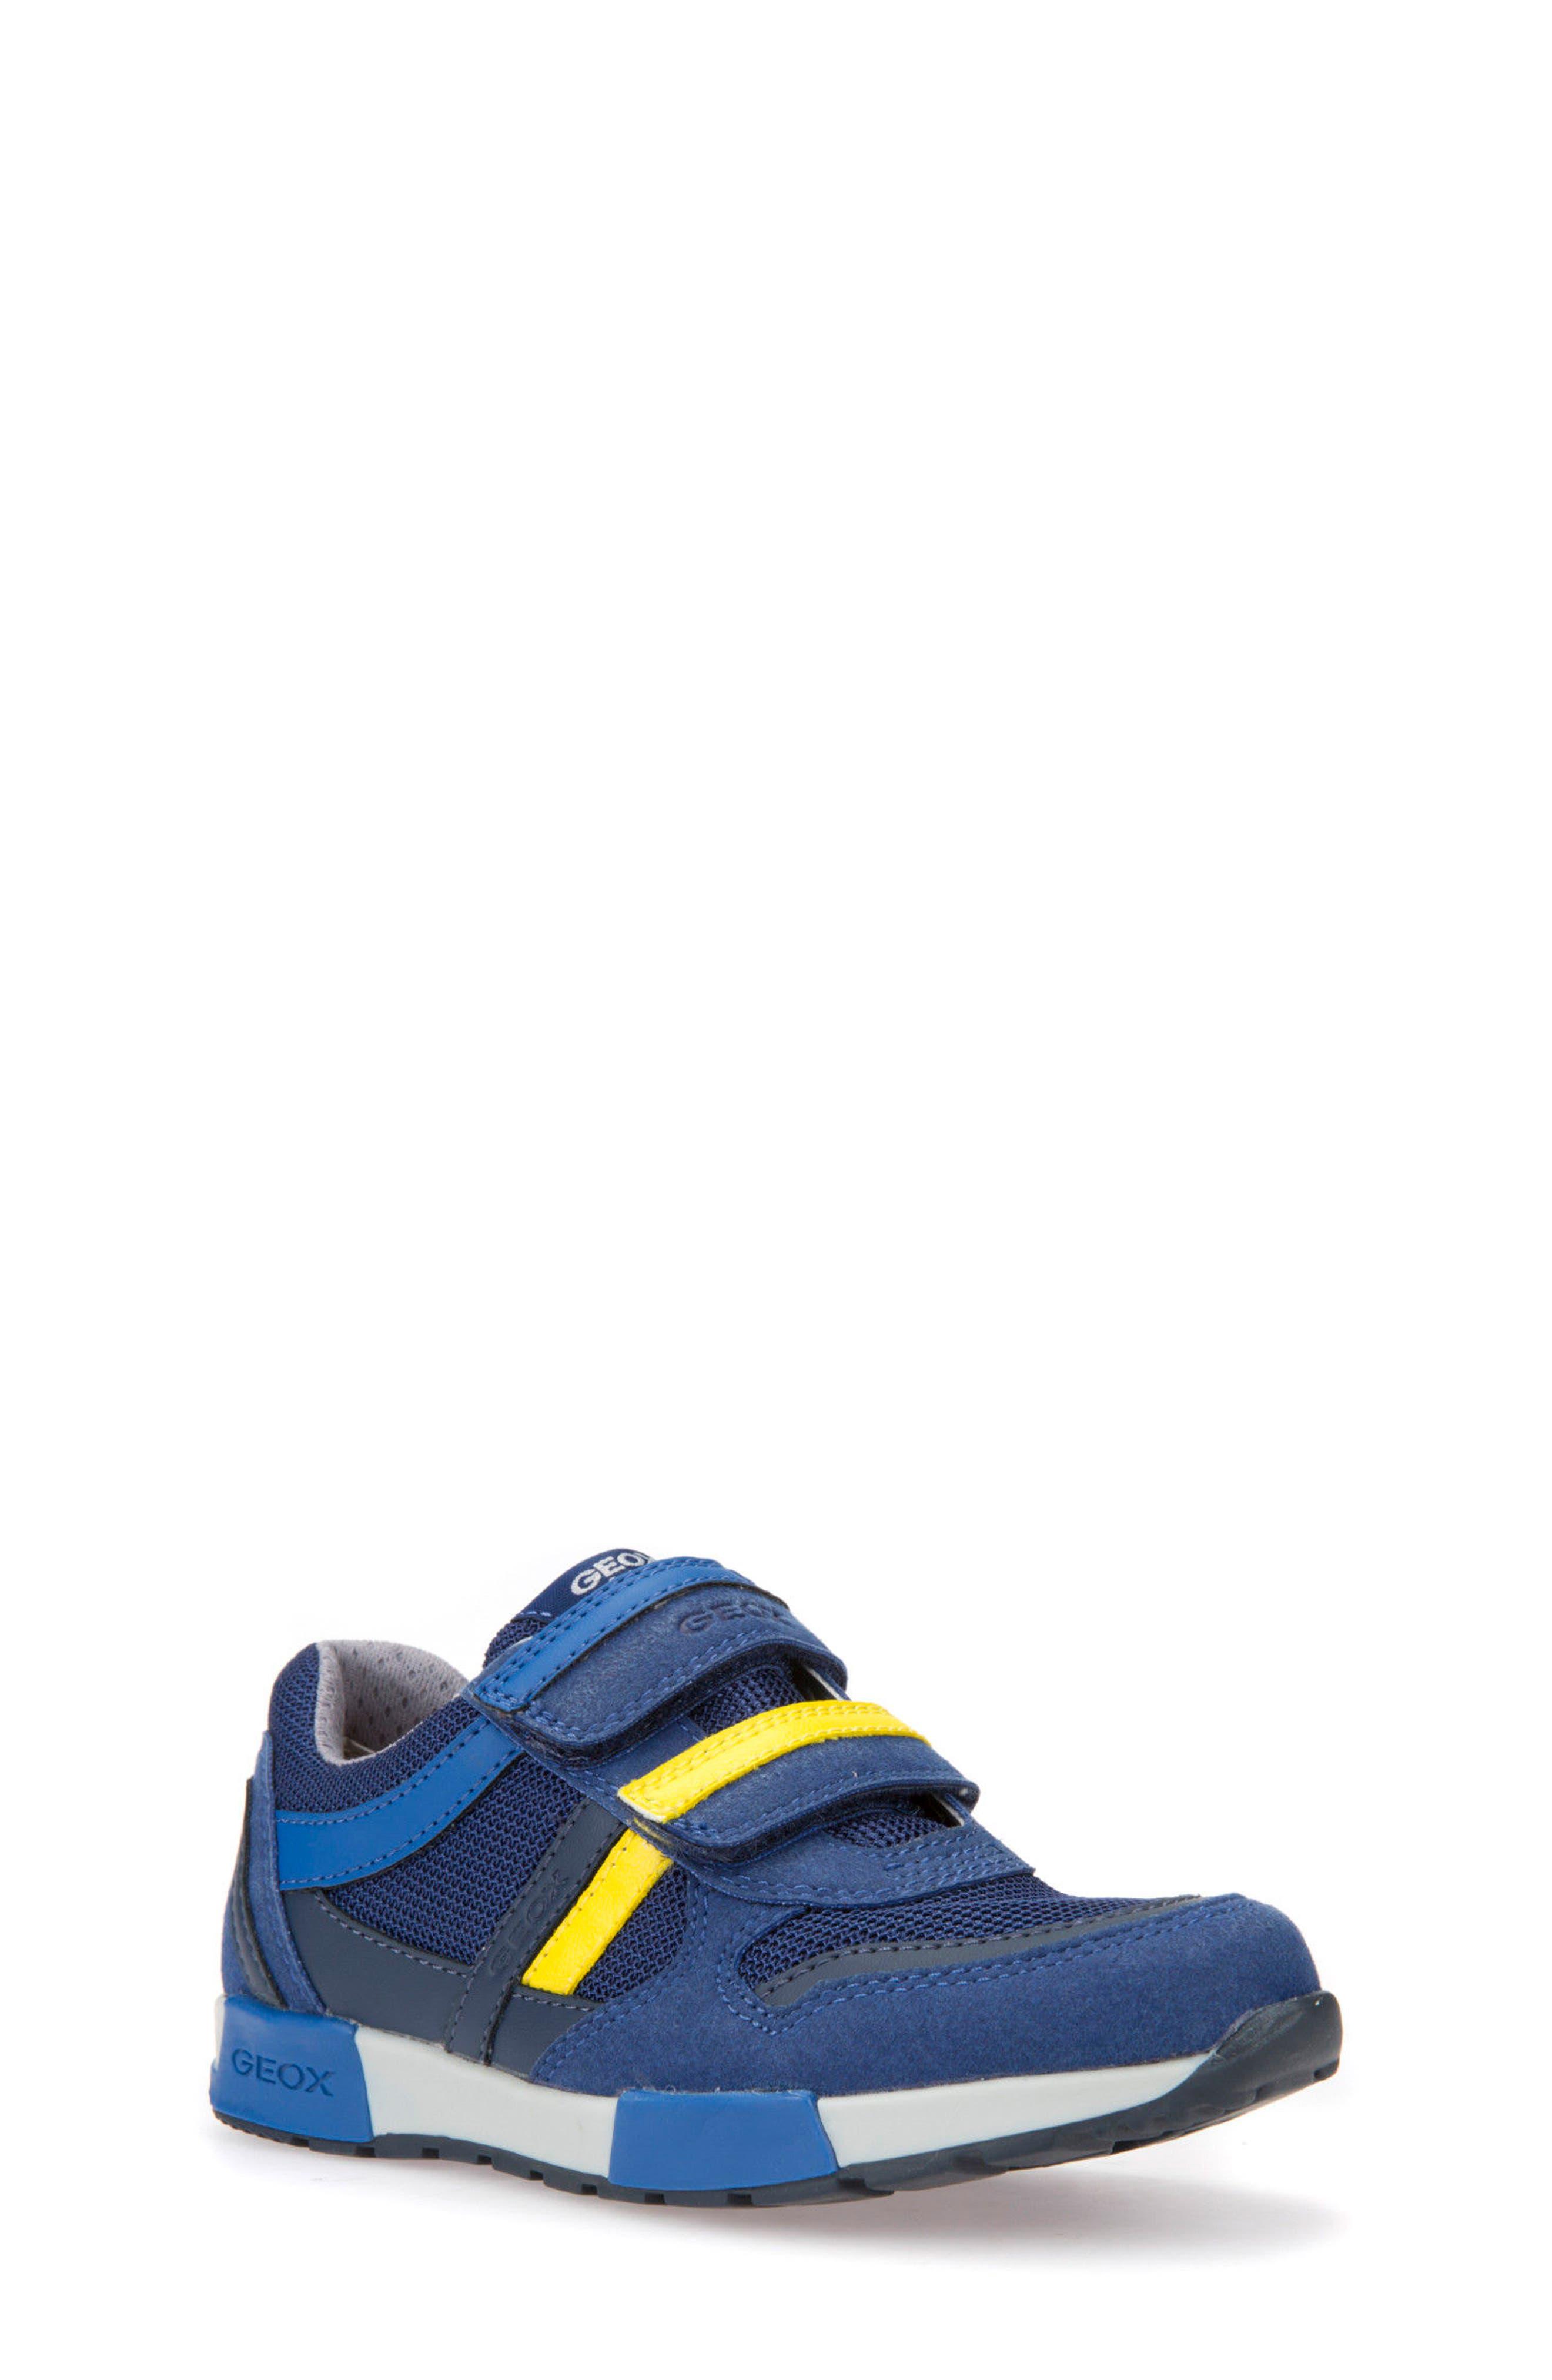 Alfier Stripe Low Top Sneaker,                             Main thumbnail 1, color,                             Blue/ Yellow